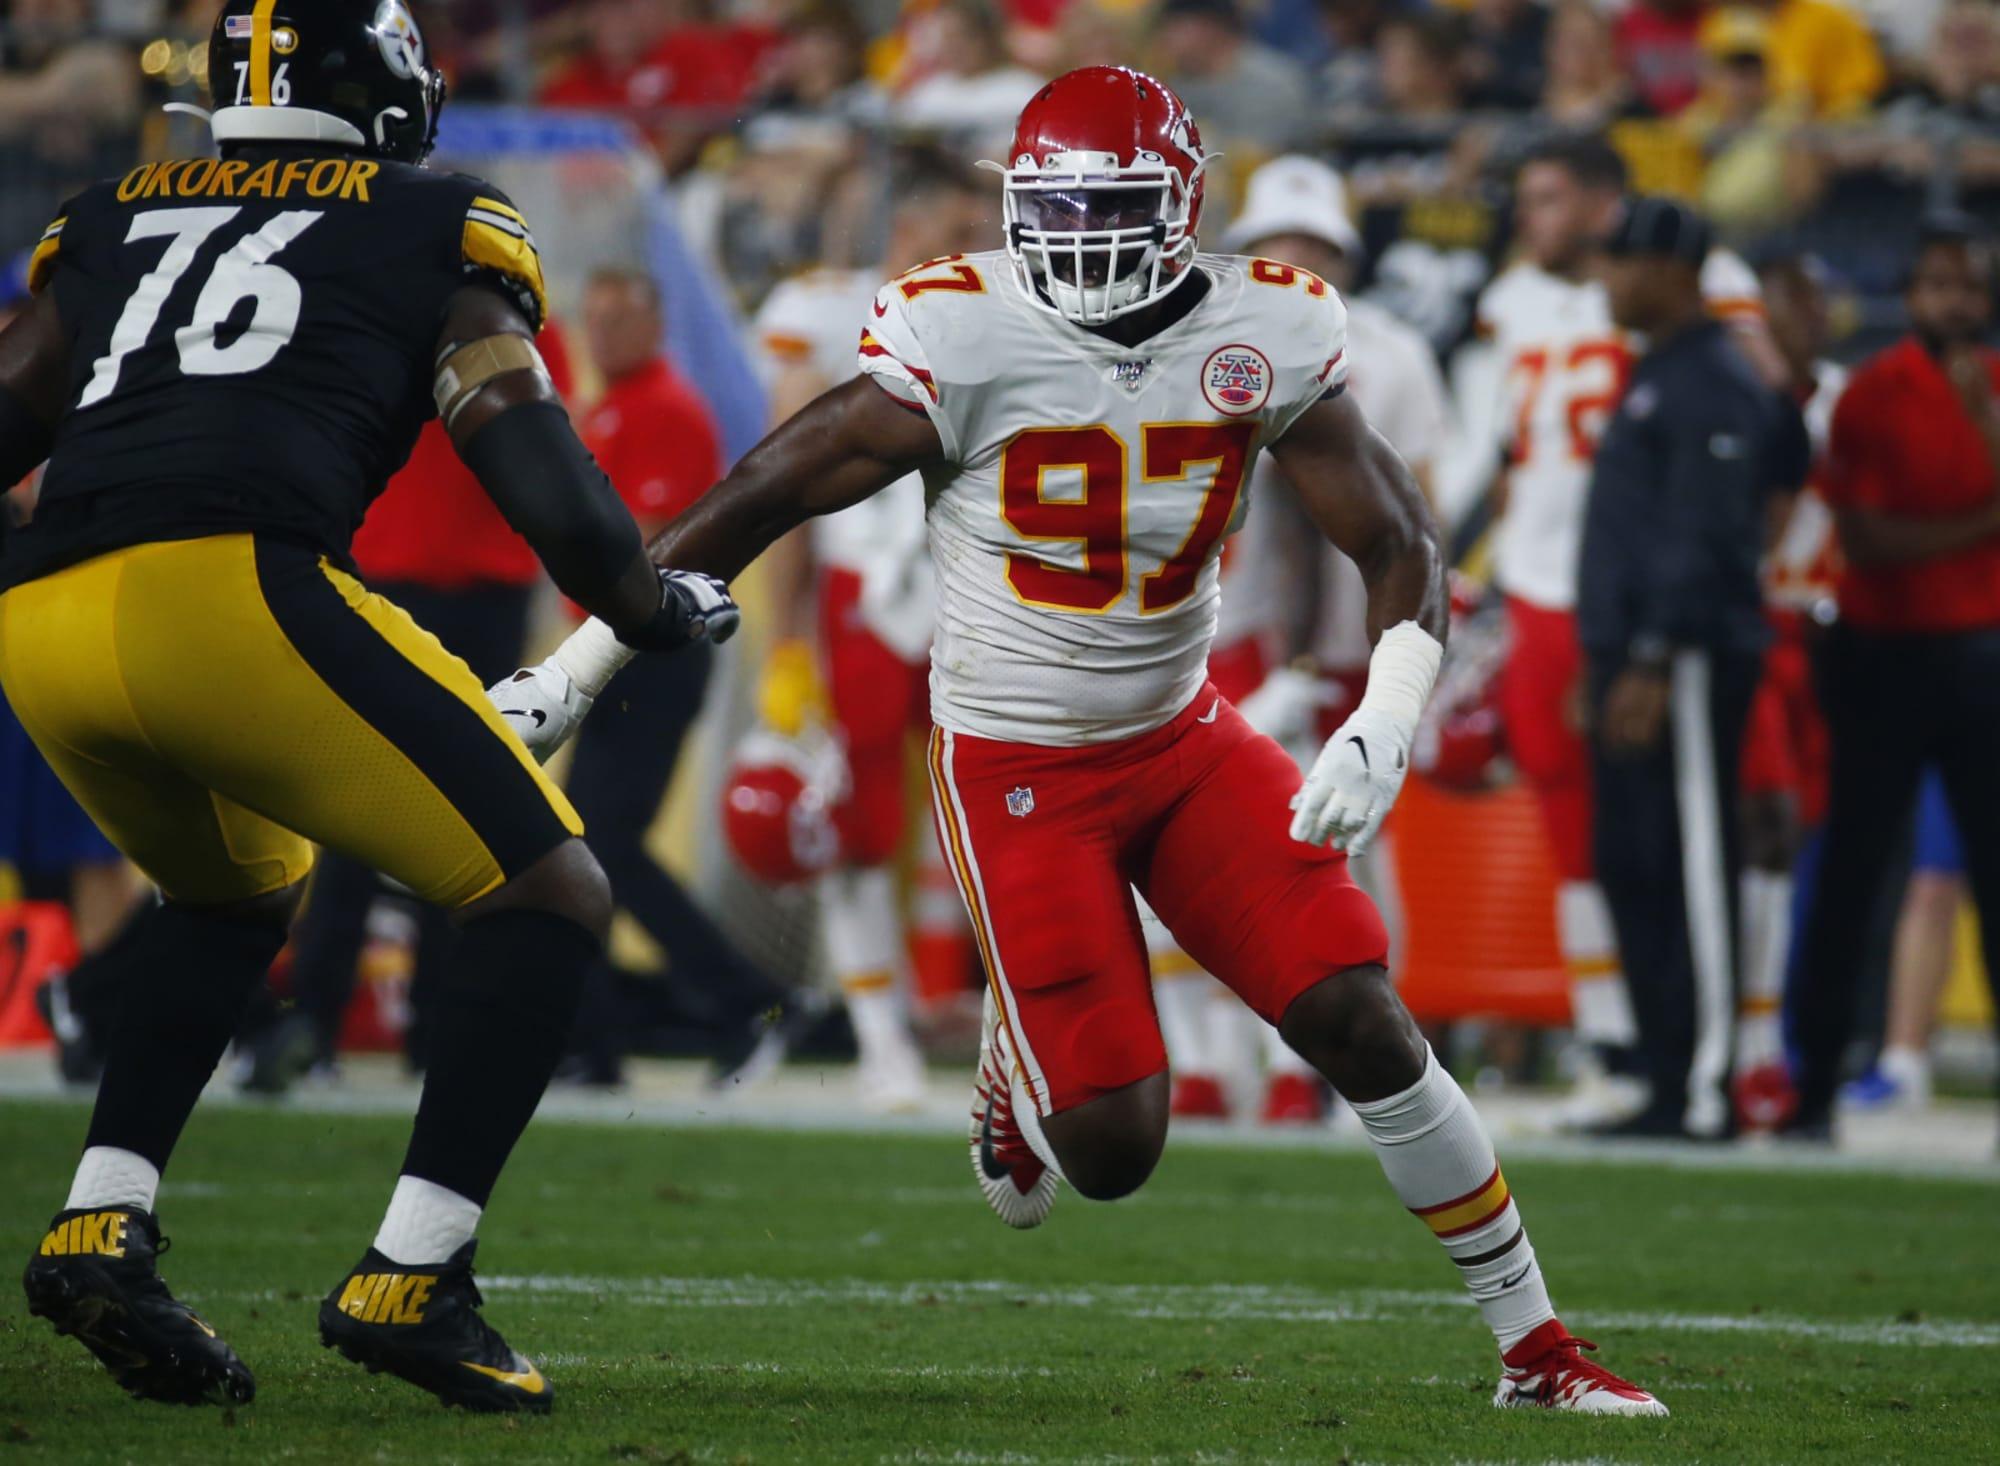 Alex Okafor's injury history presents Chiefs with slight concerns